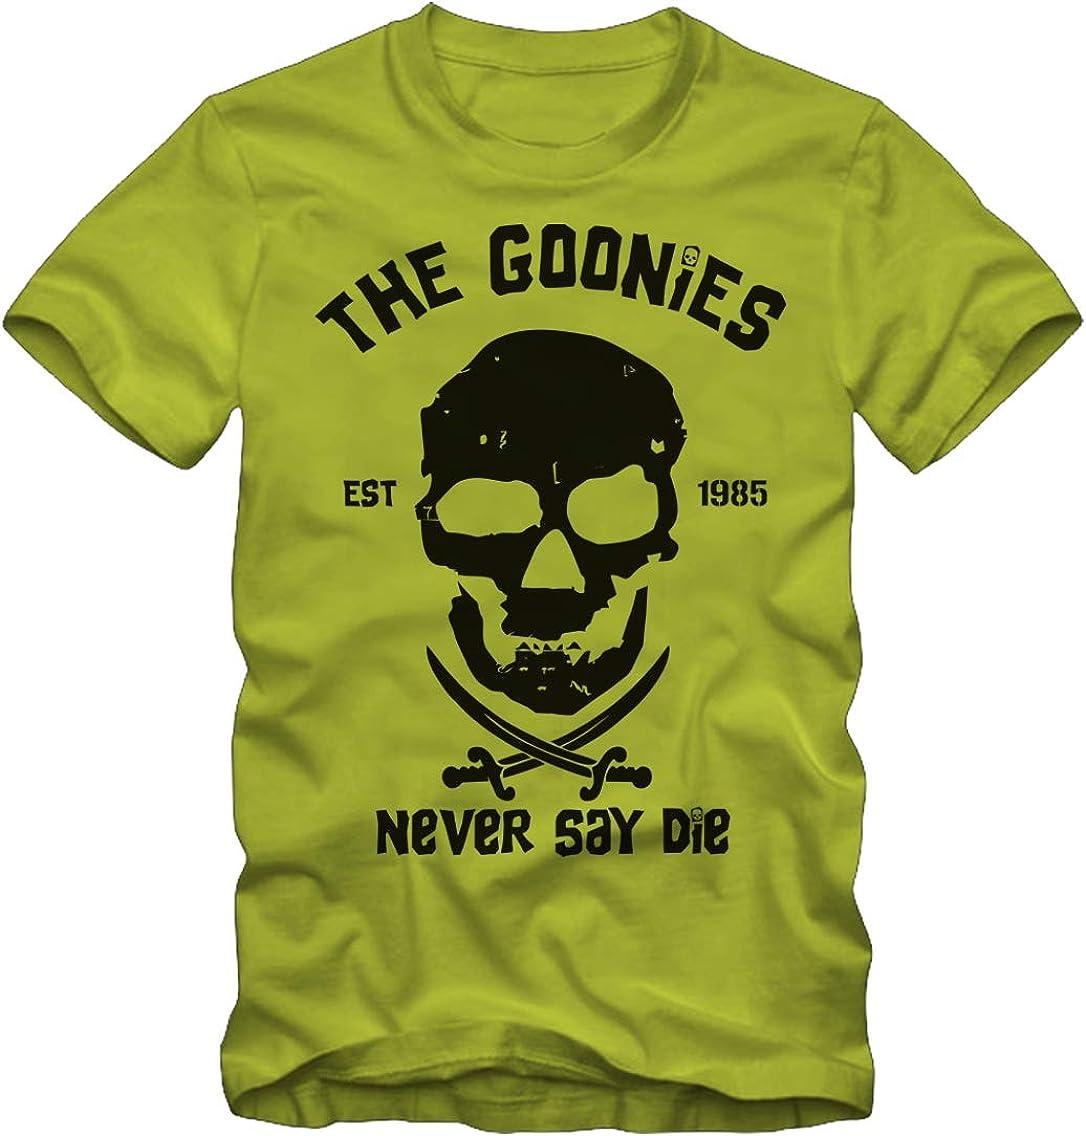 Bisura T-Shirt The Goonies Never Say Die Film 1985